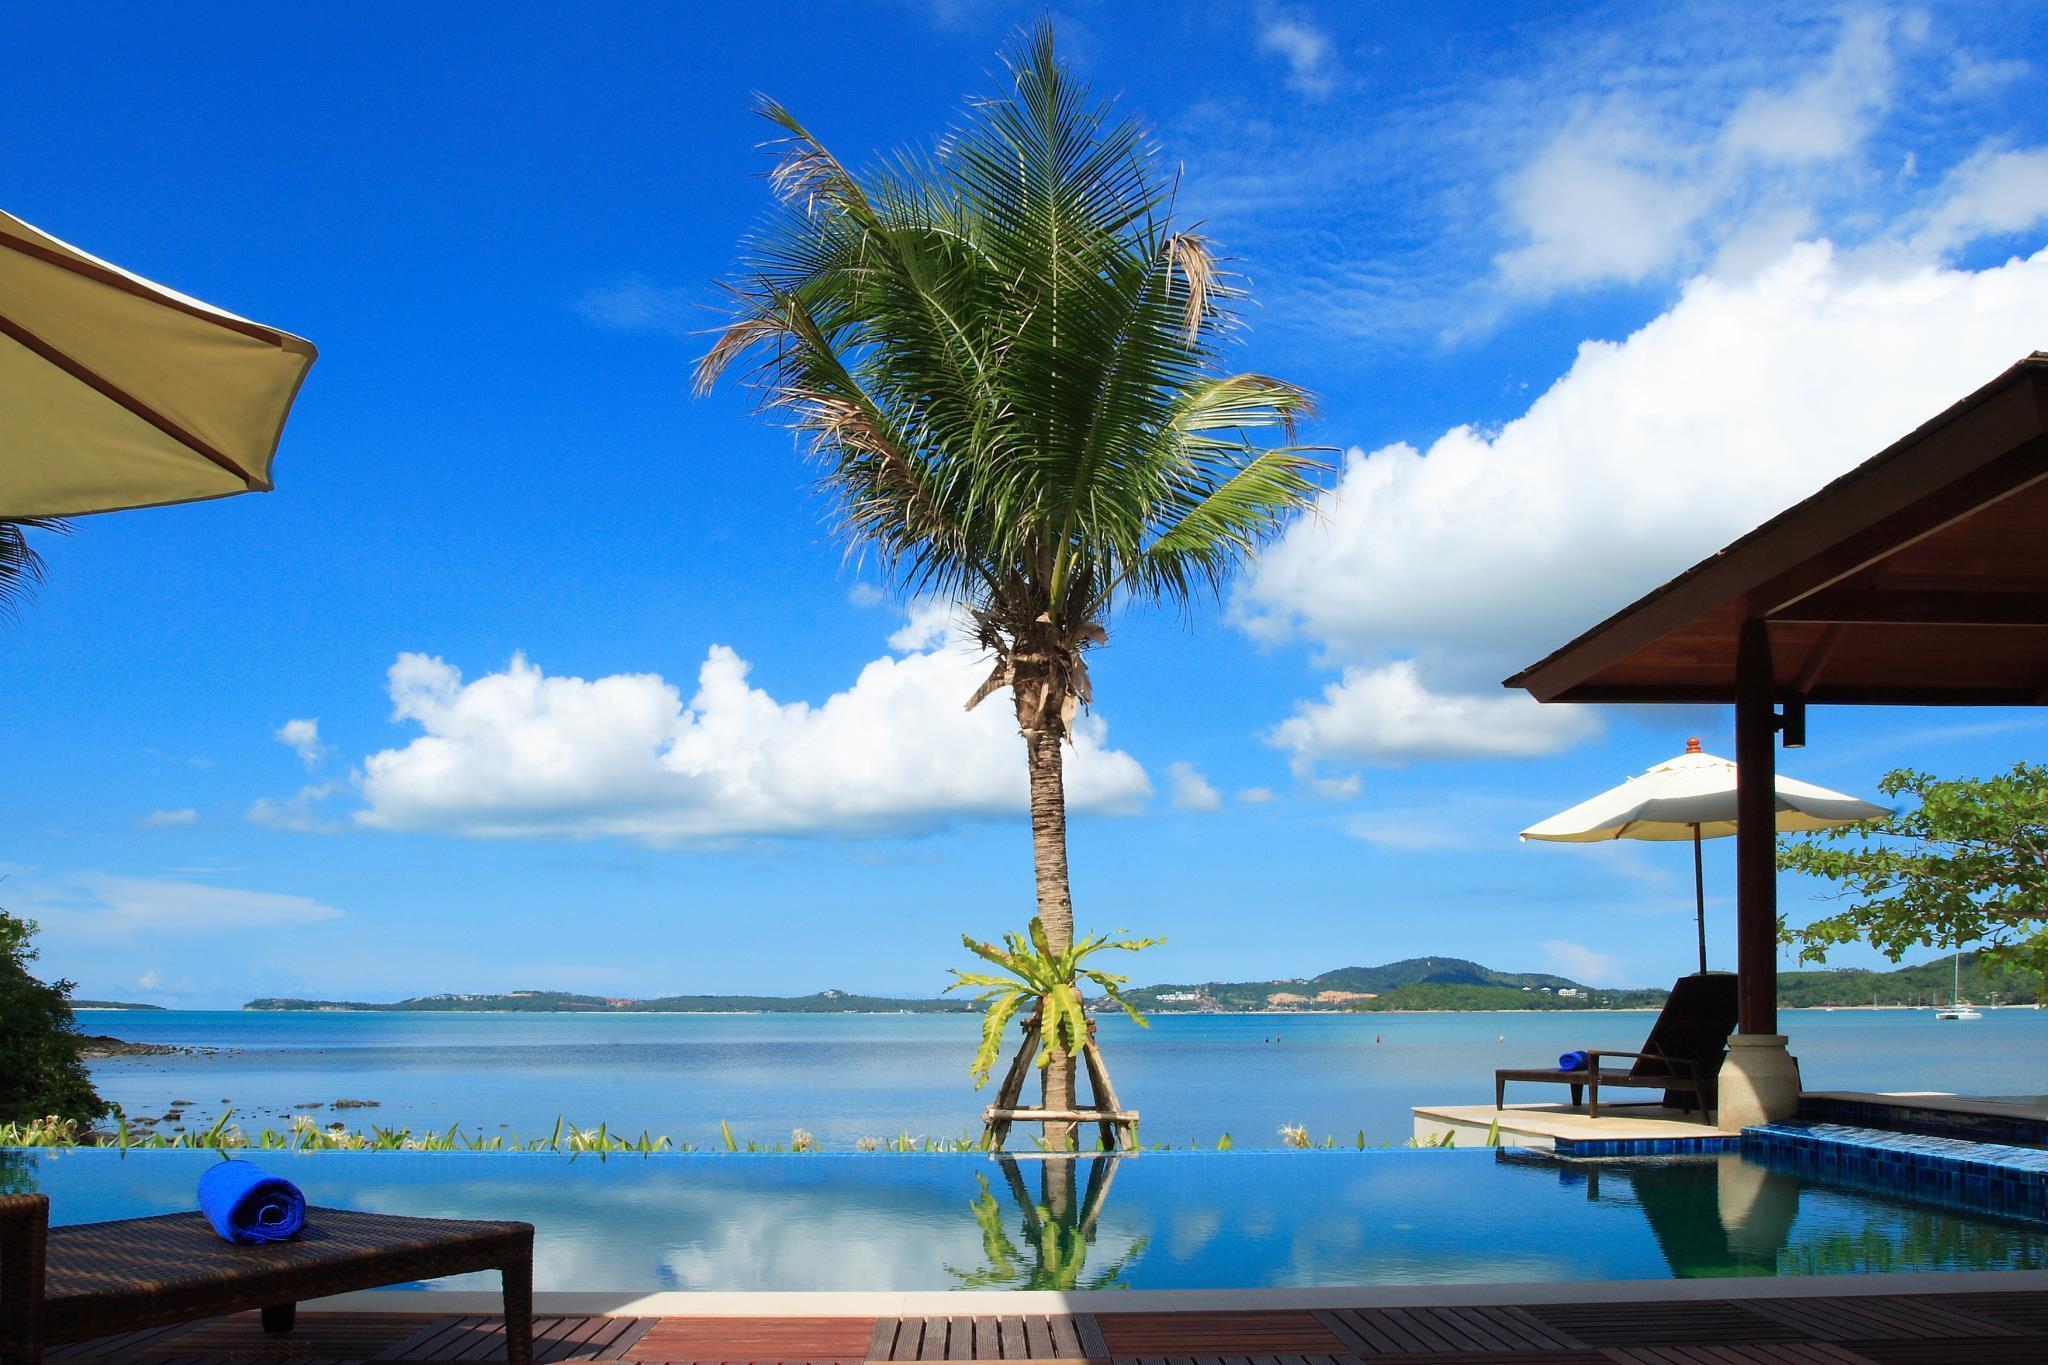 Baan Benjamart Dhevatara Residence Villa 1 -Beachfront, 4 Bedroom